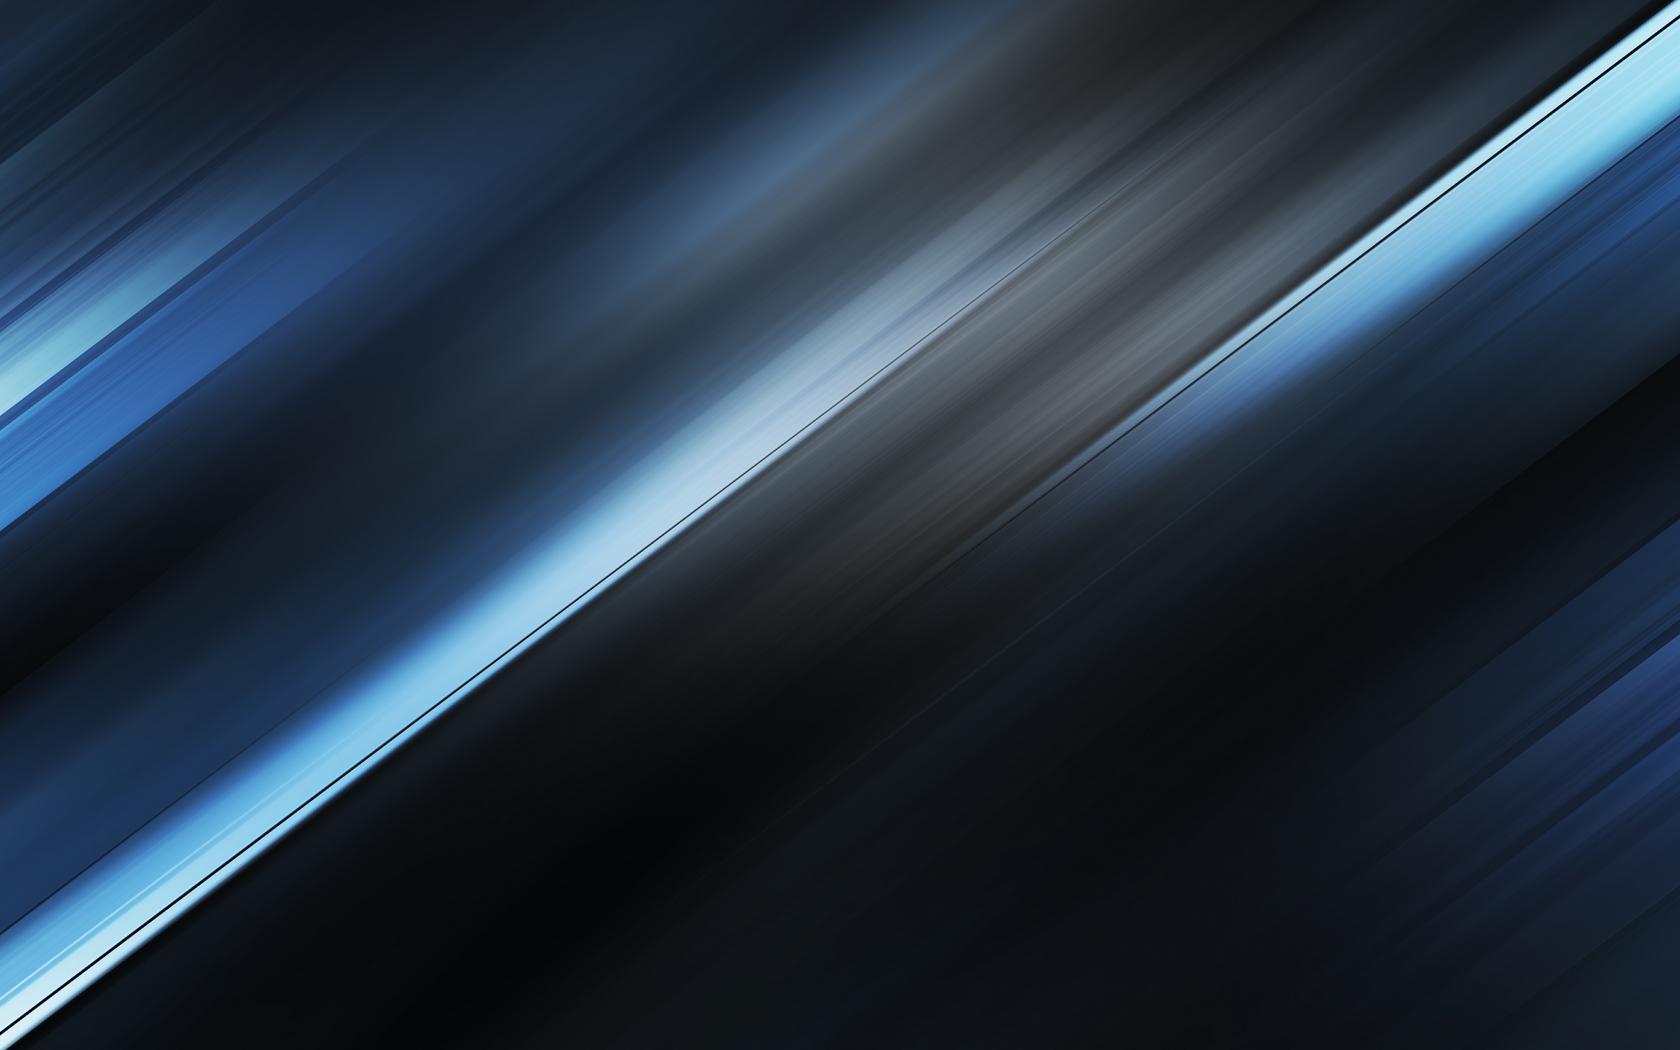 Blue Metallic Background Wallpapers HD 413843 2560x1440 Download Resolutions Desktop 1920x1080